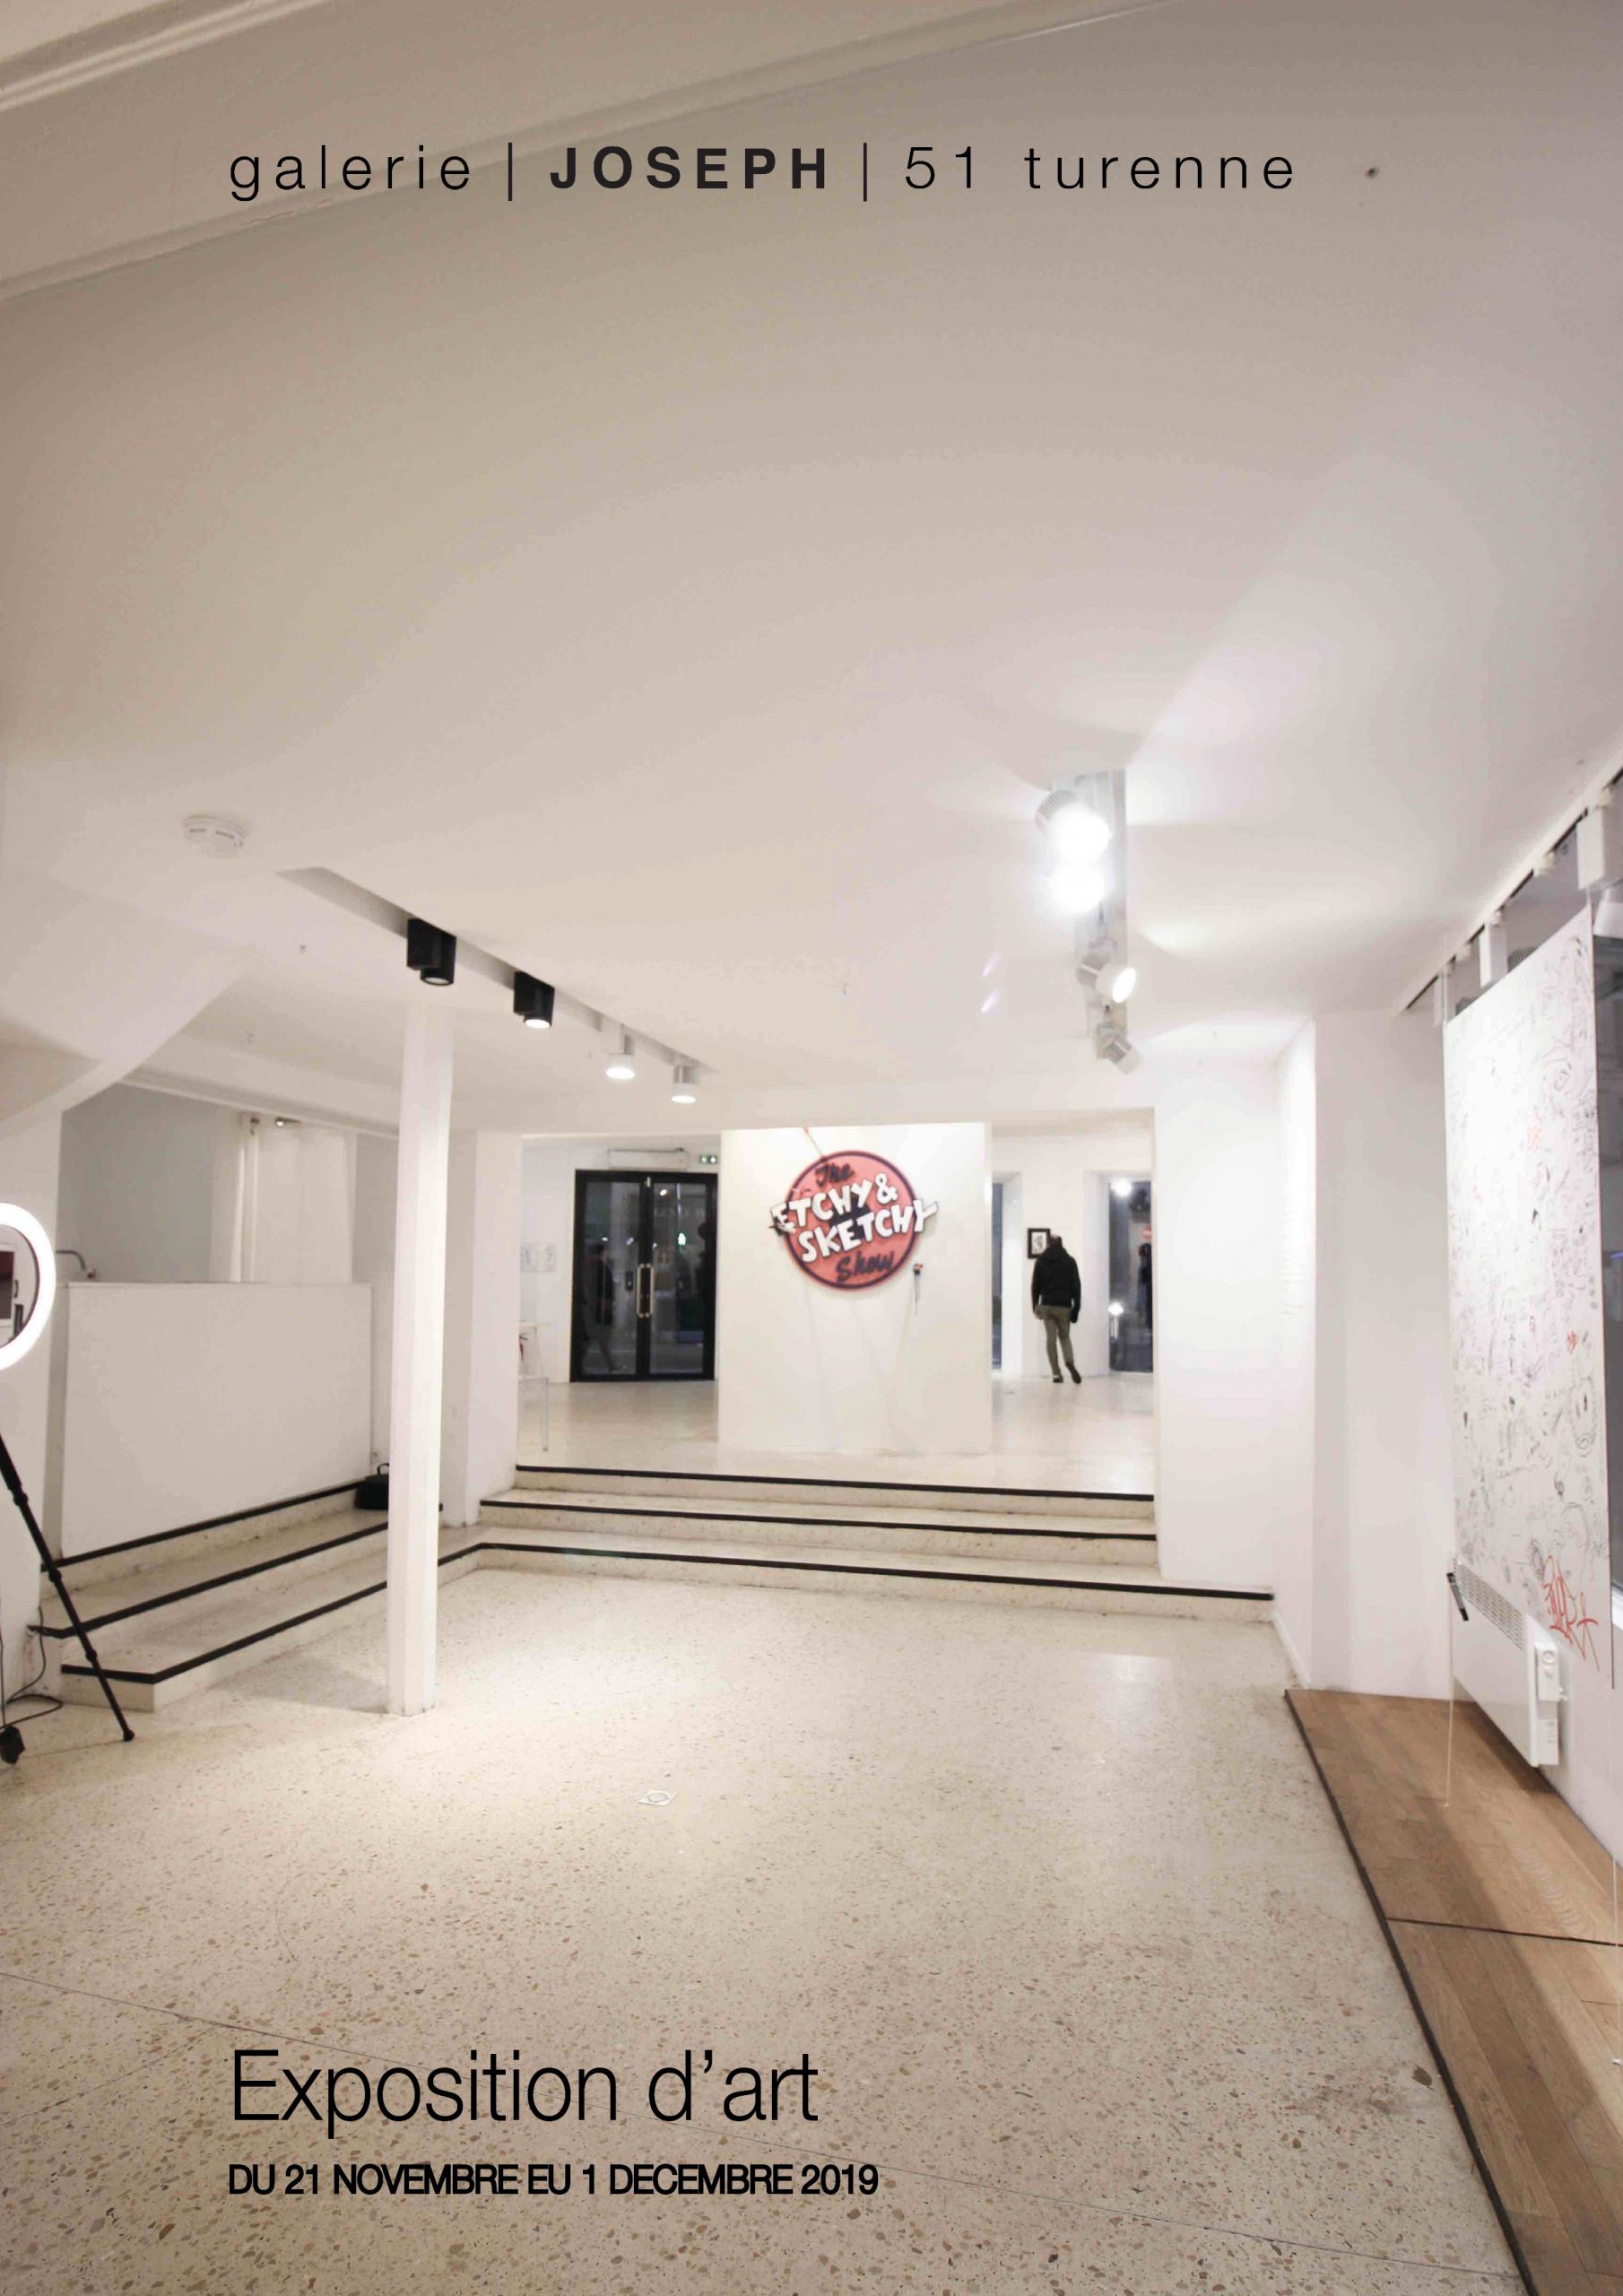 Exposition d'art - PEZ